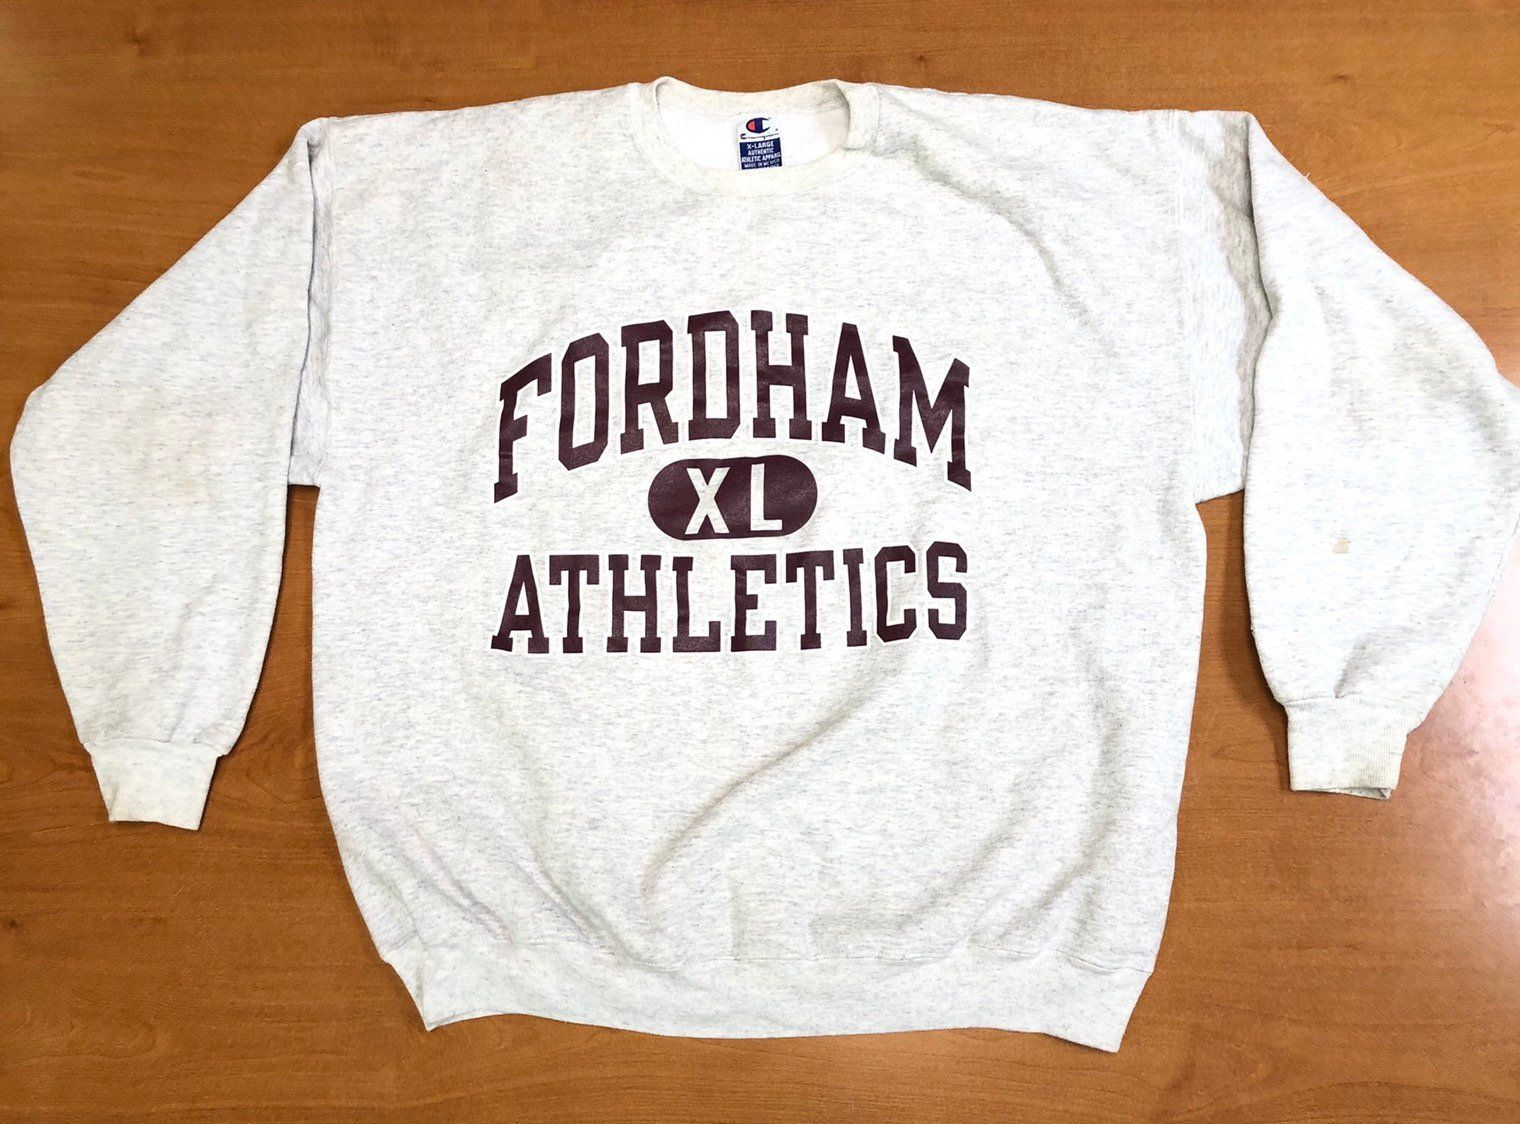 Vintage 1990s Fordham University Crewneck Sweatshirt Champion Size Xl Hoodie Cross Country Track Basketball Sports Sweatshirts Sweatshirts Crew Neck Sweatshirt [ 1124 x 1520 Pixel ]